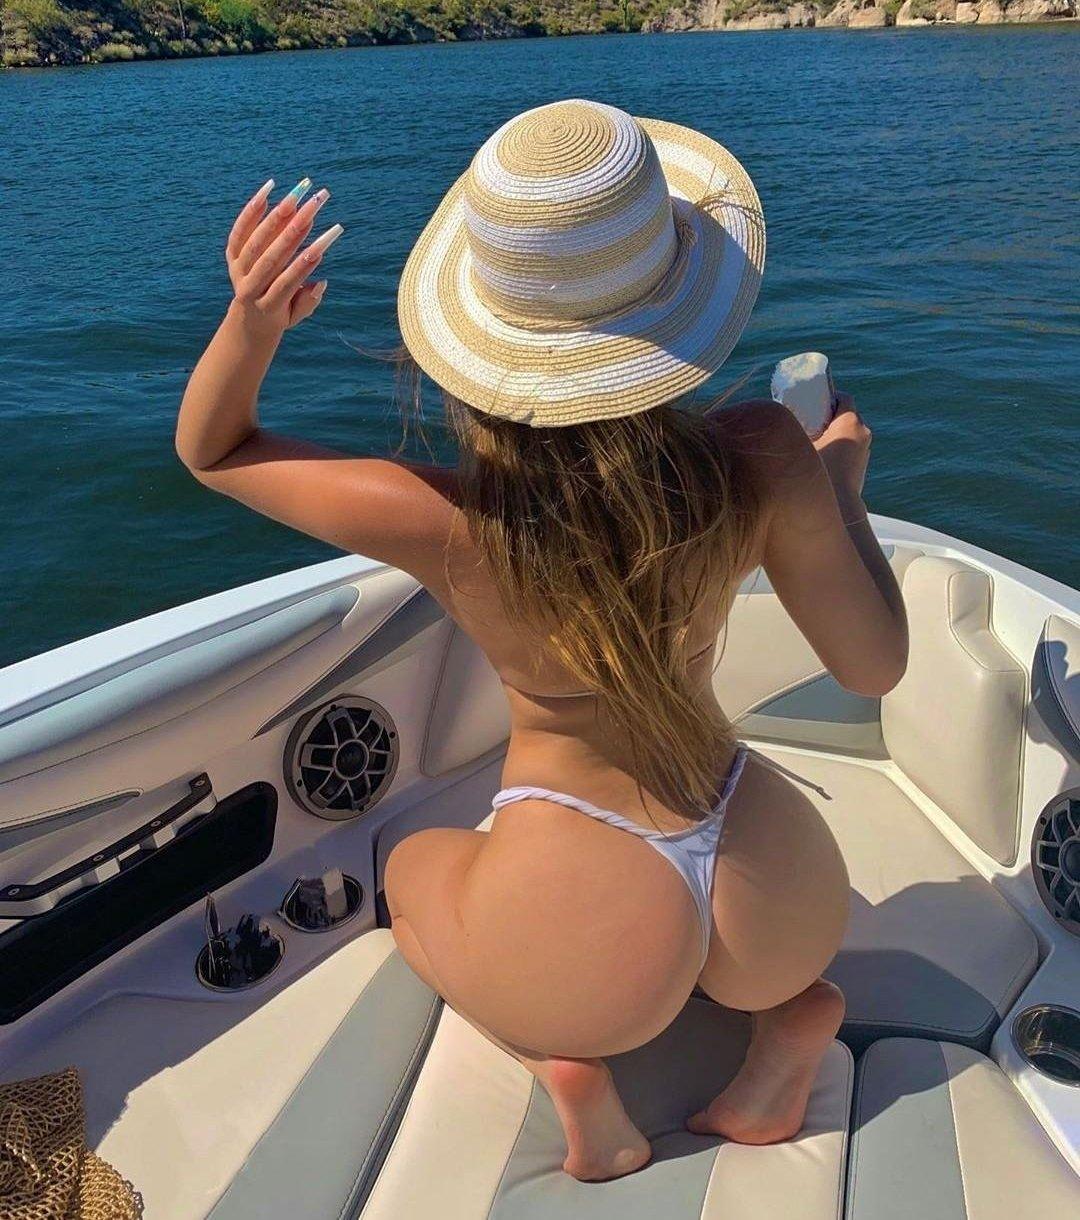 Kalysta Mallory Ksmoothie Onlyfans Nude Leaks 0020